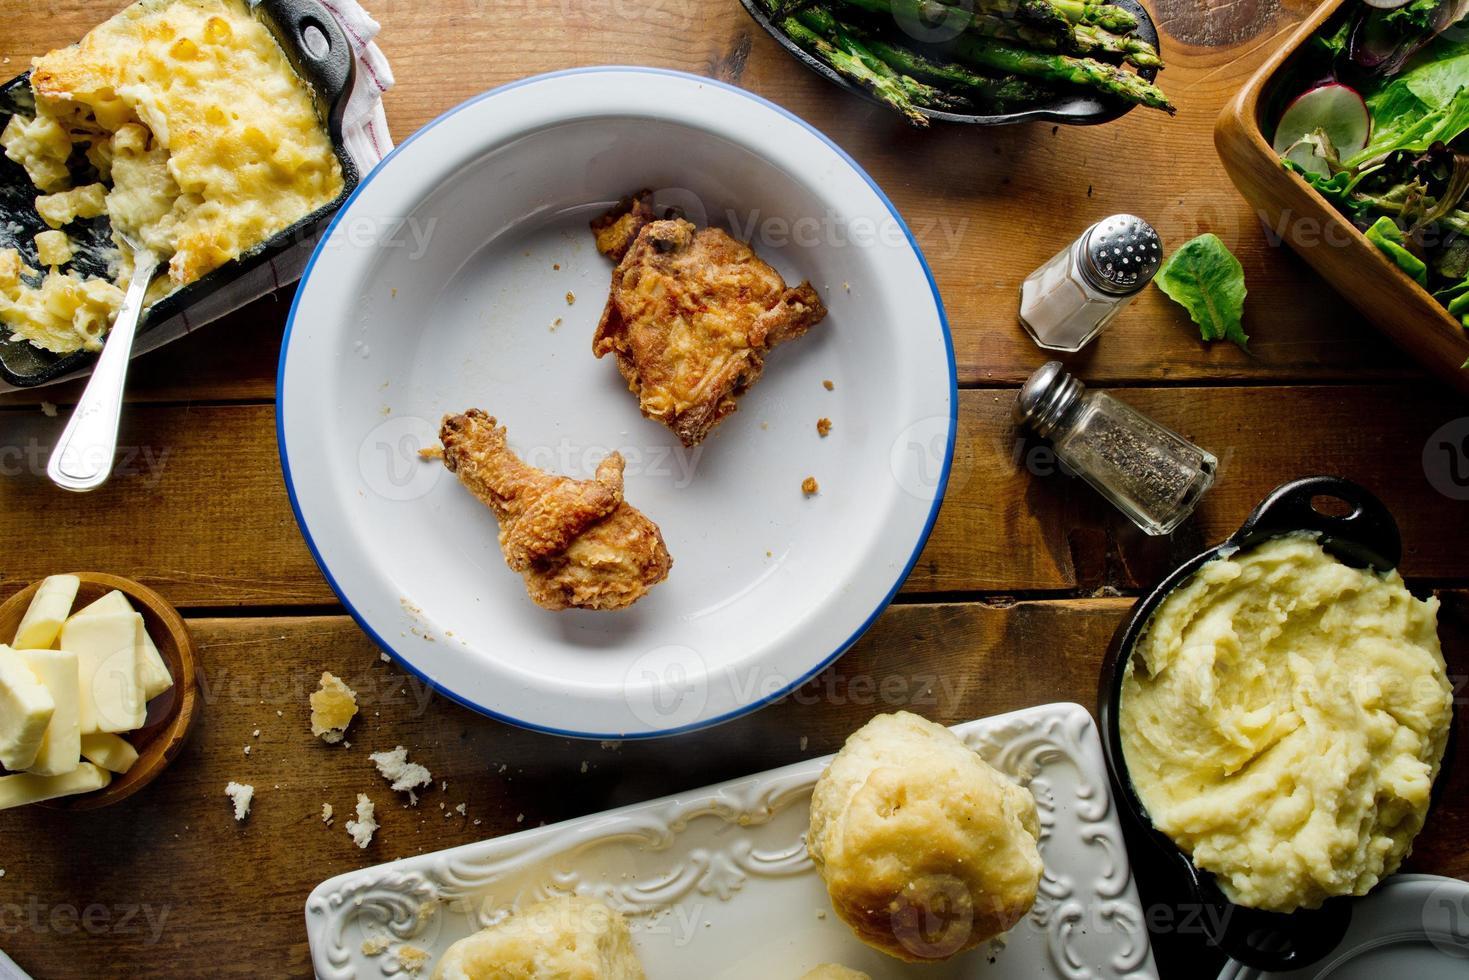 Fried Chicken Sunday Supper photo